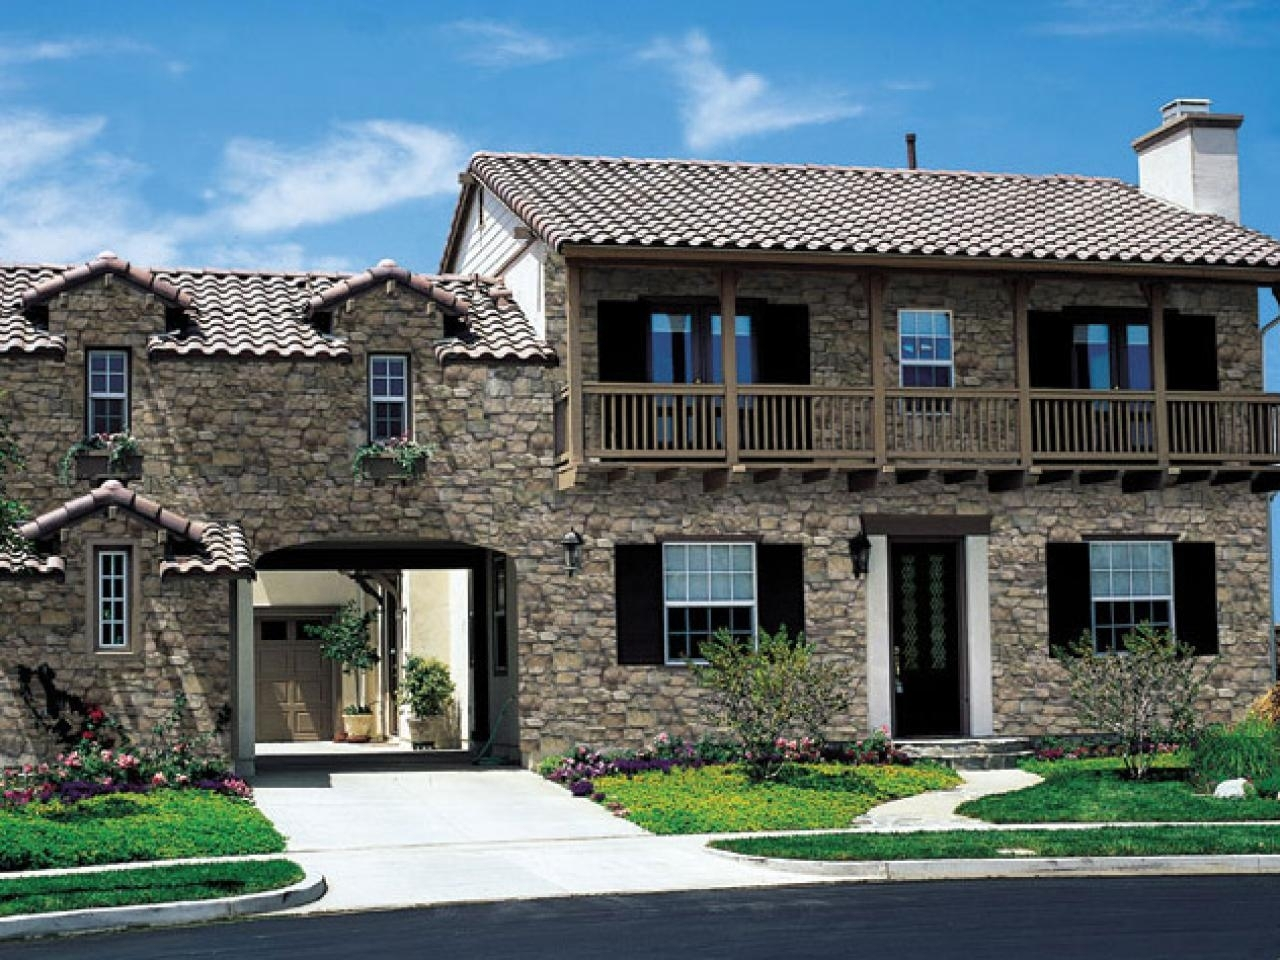 Two Tone House Siding Ideas - Madison Art Center Design on Modern Siding Ideas  id=61929